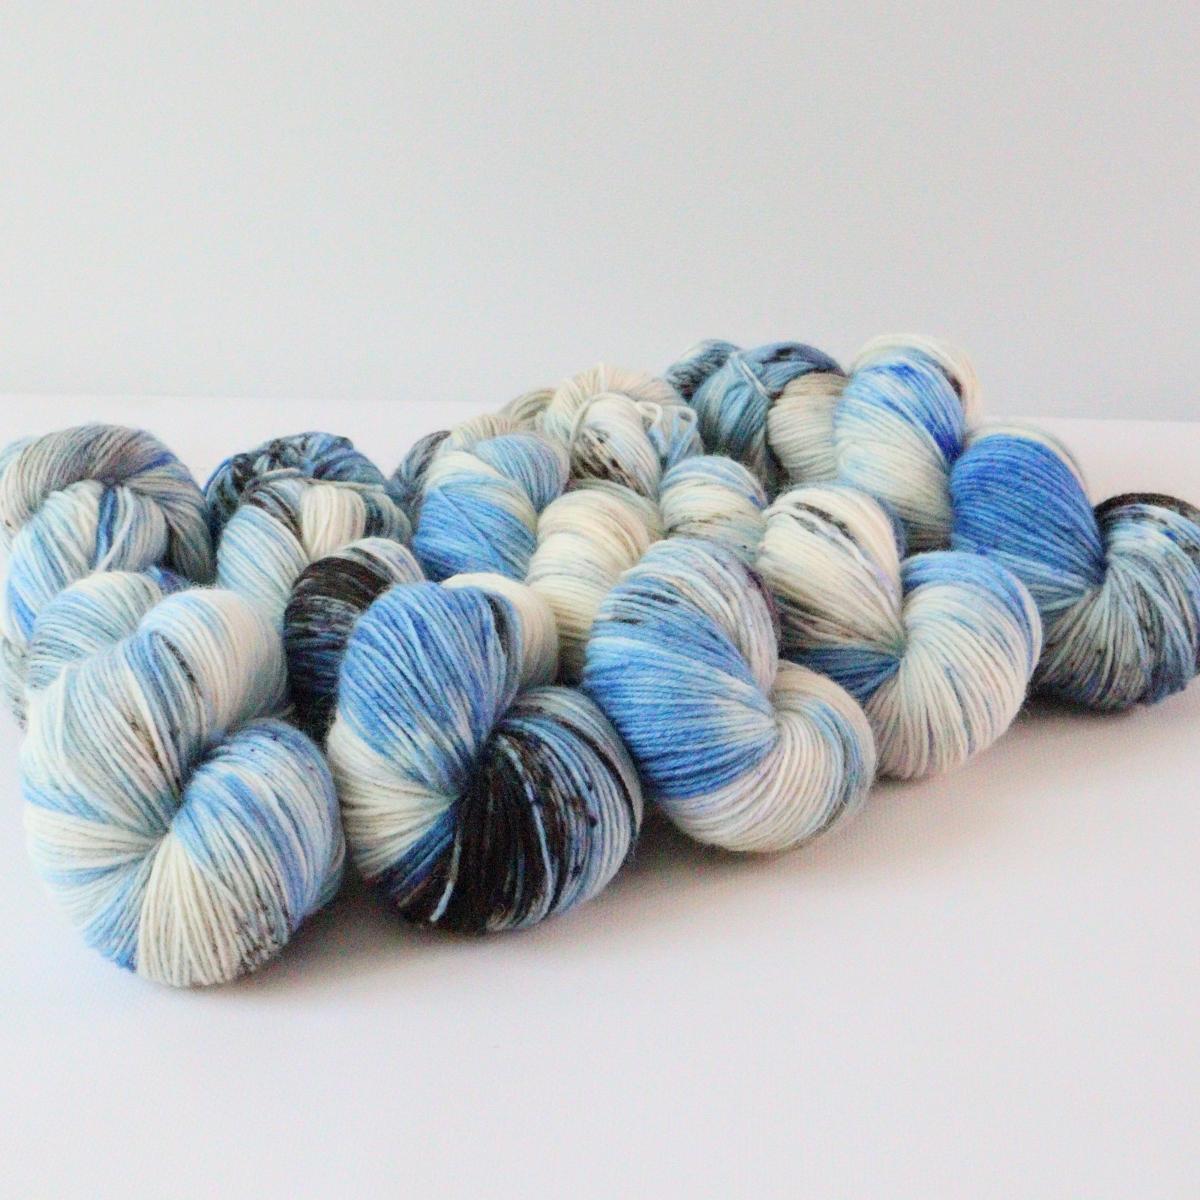 woodico.pro hand dyed yarn 081 2 1200x1200 - Hand dyed yarn / 081